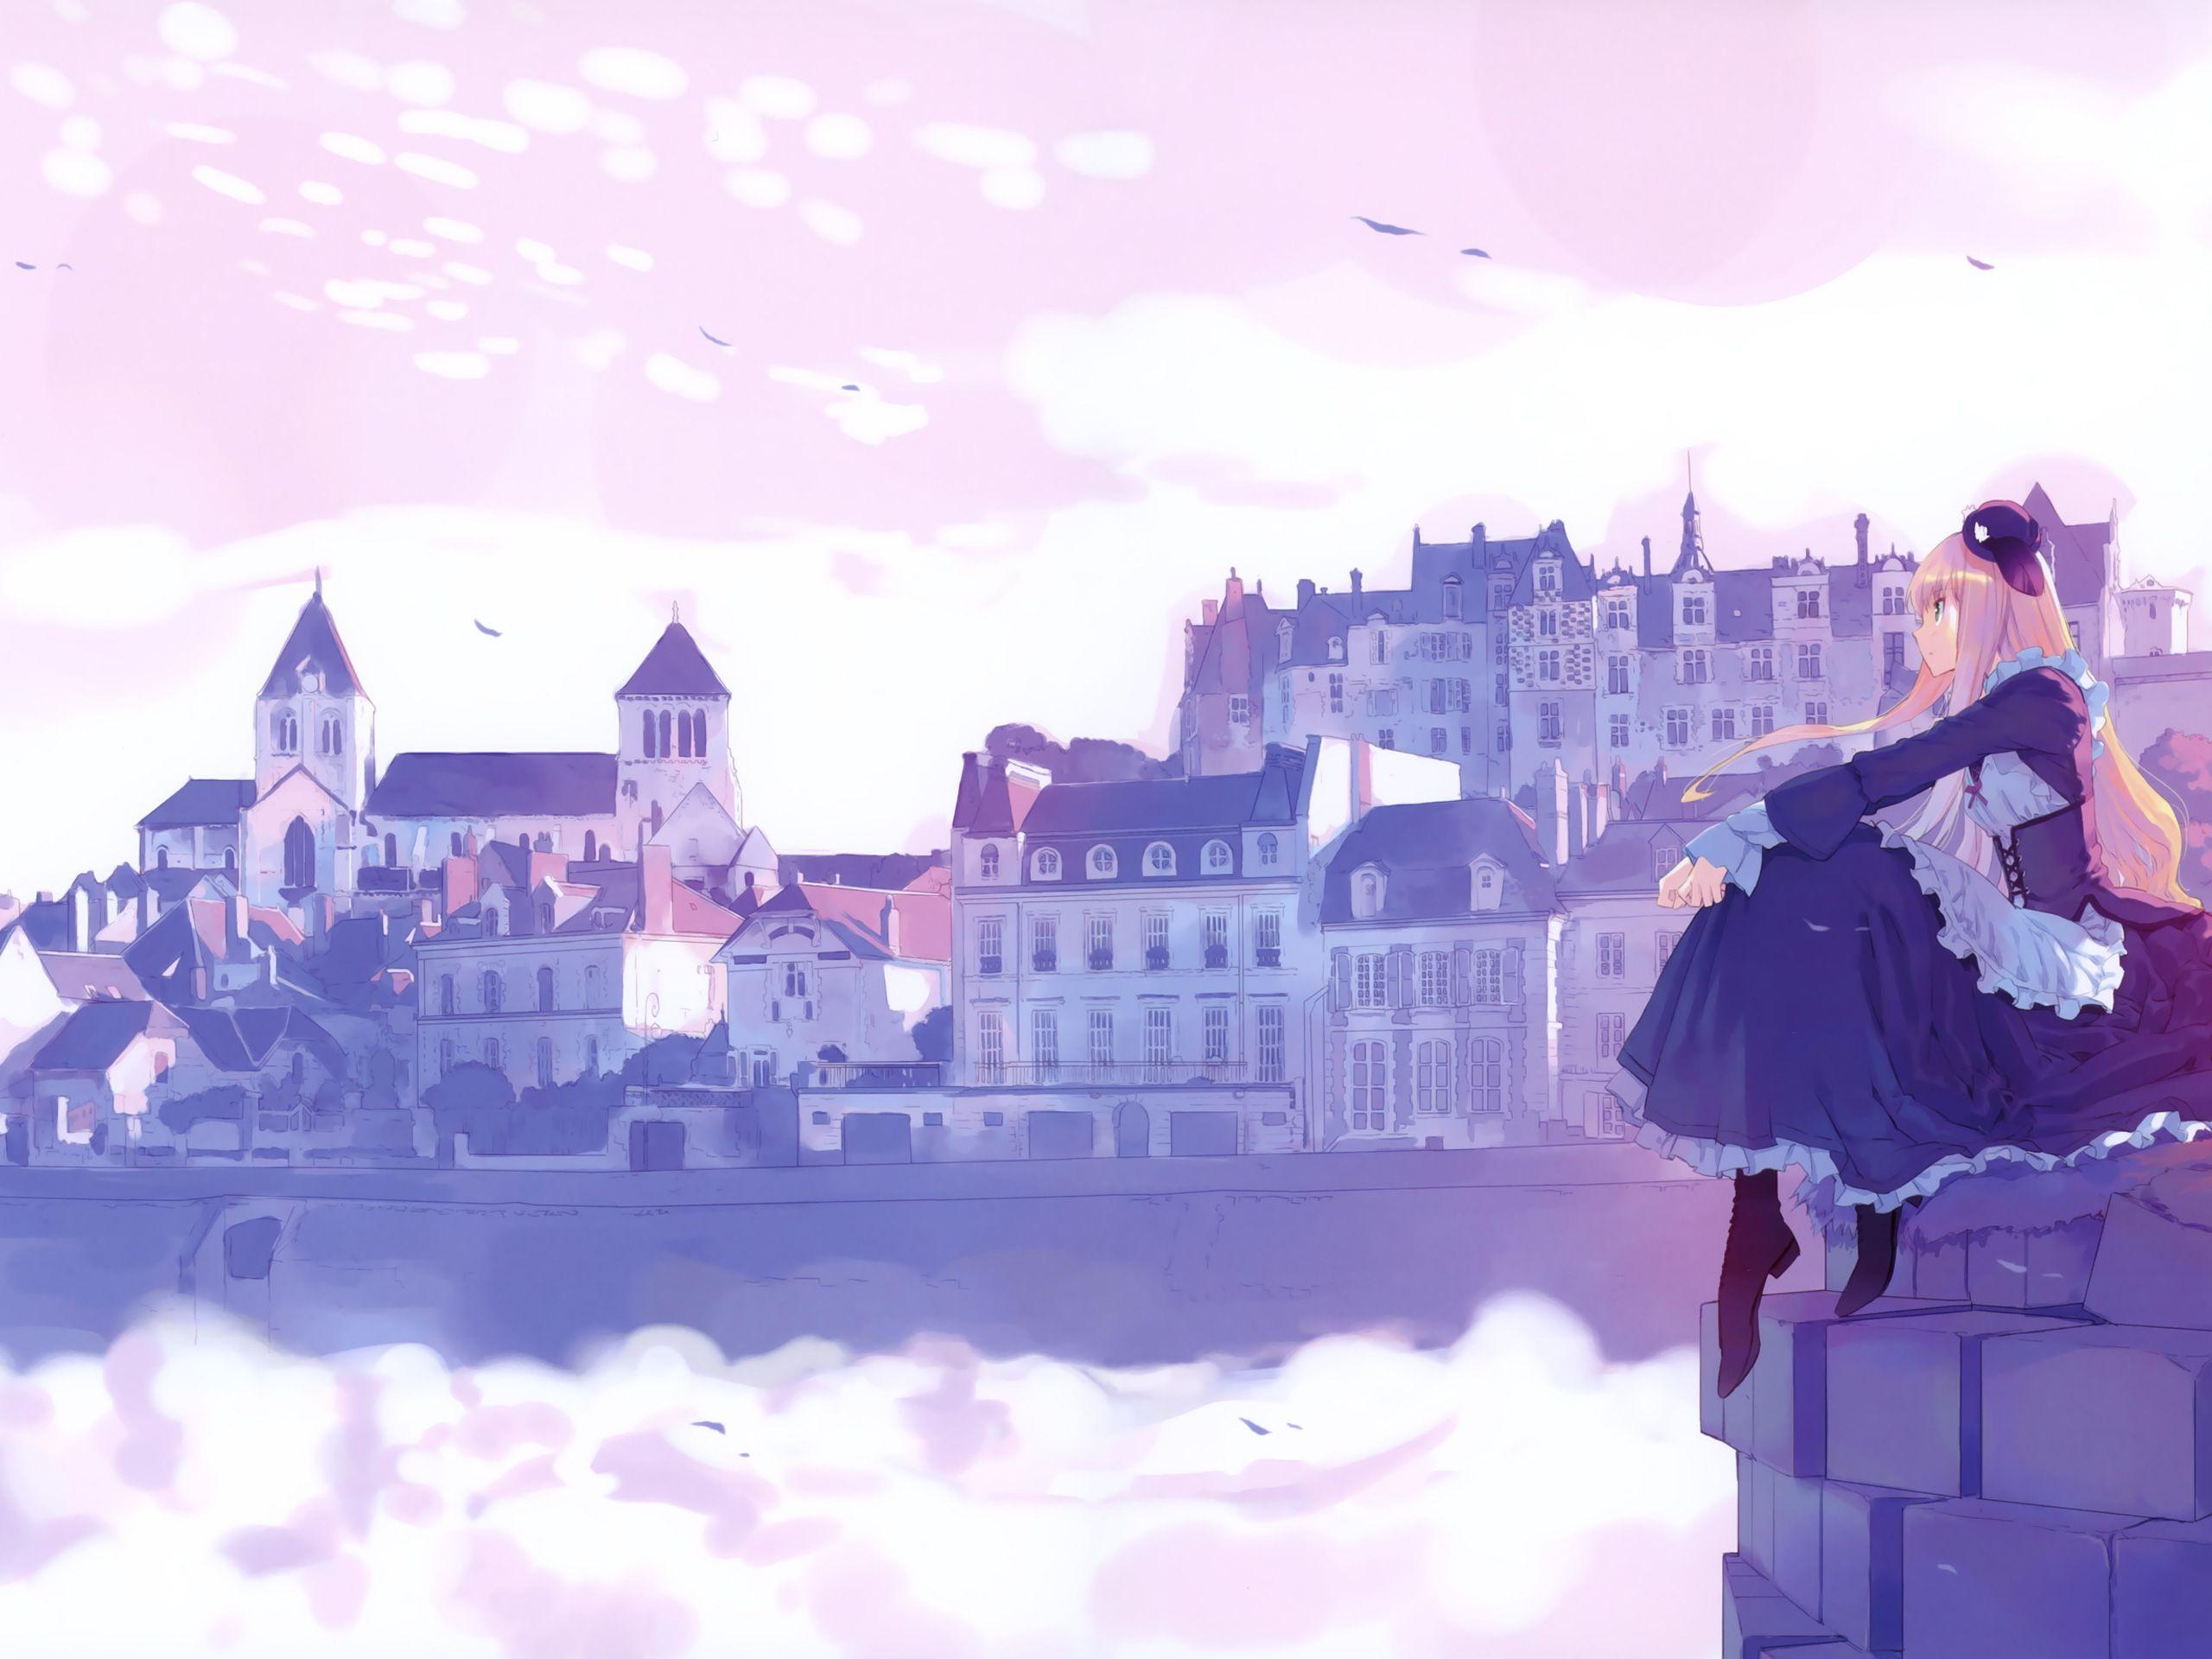 Pin By James Edward Mcdonald On Anime Stuff Style Anime Scenery